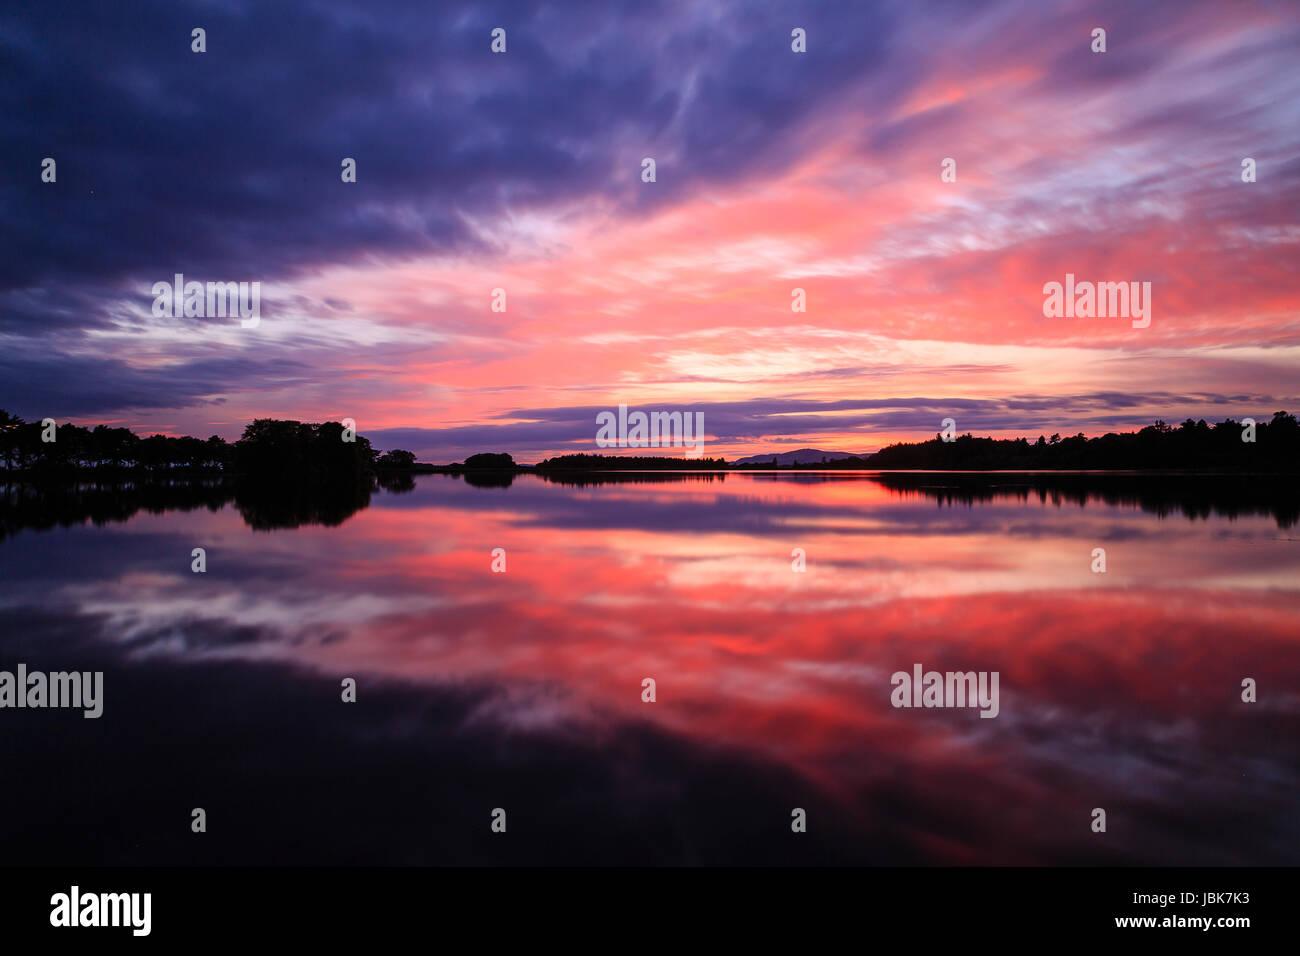 A wonderful sunset at Monikie Reservoir, Angus - Stock Image